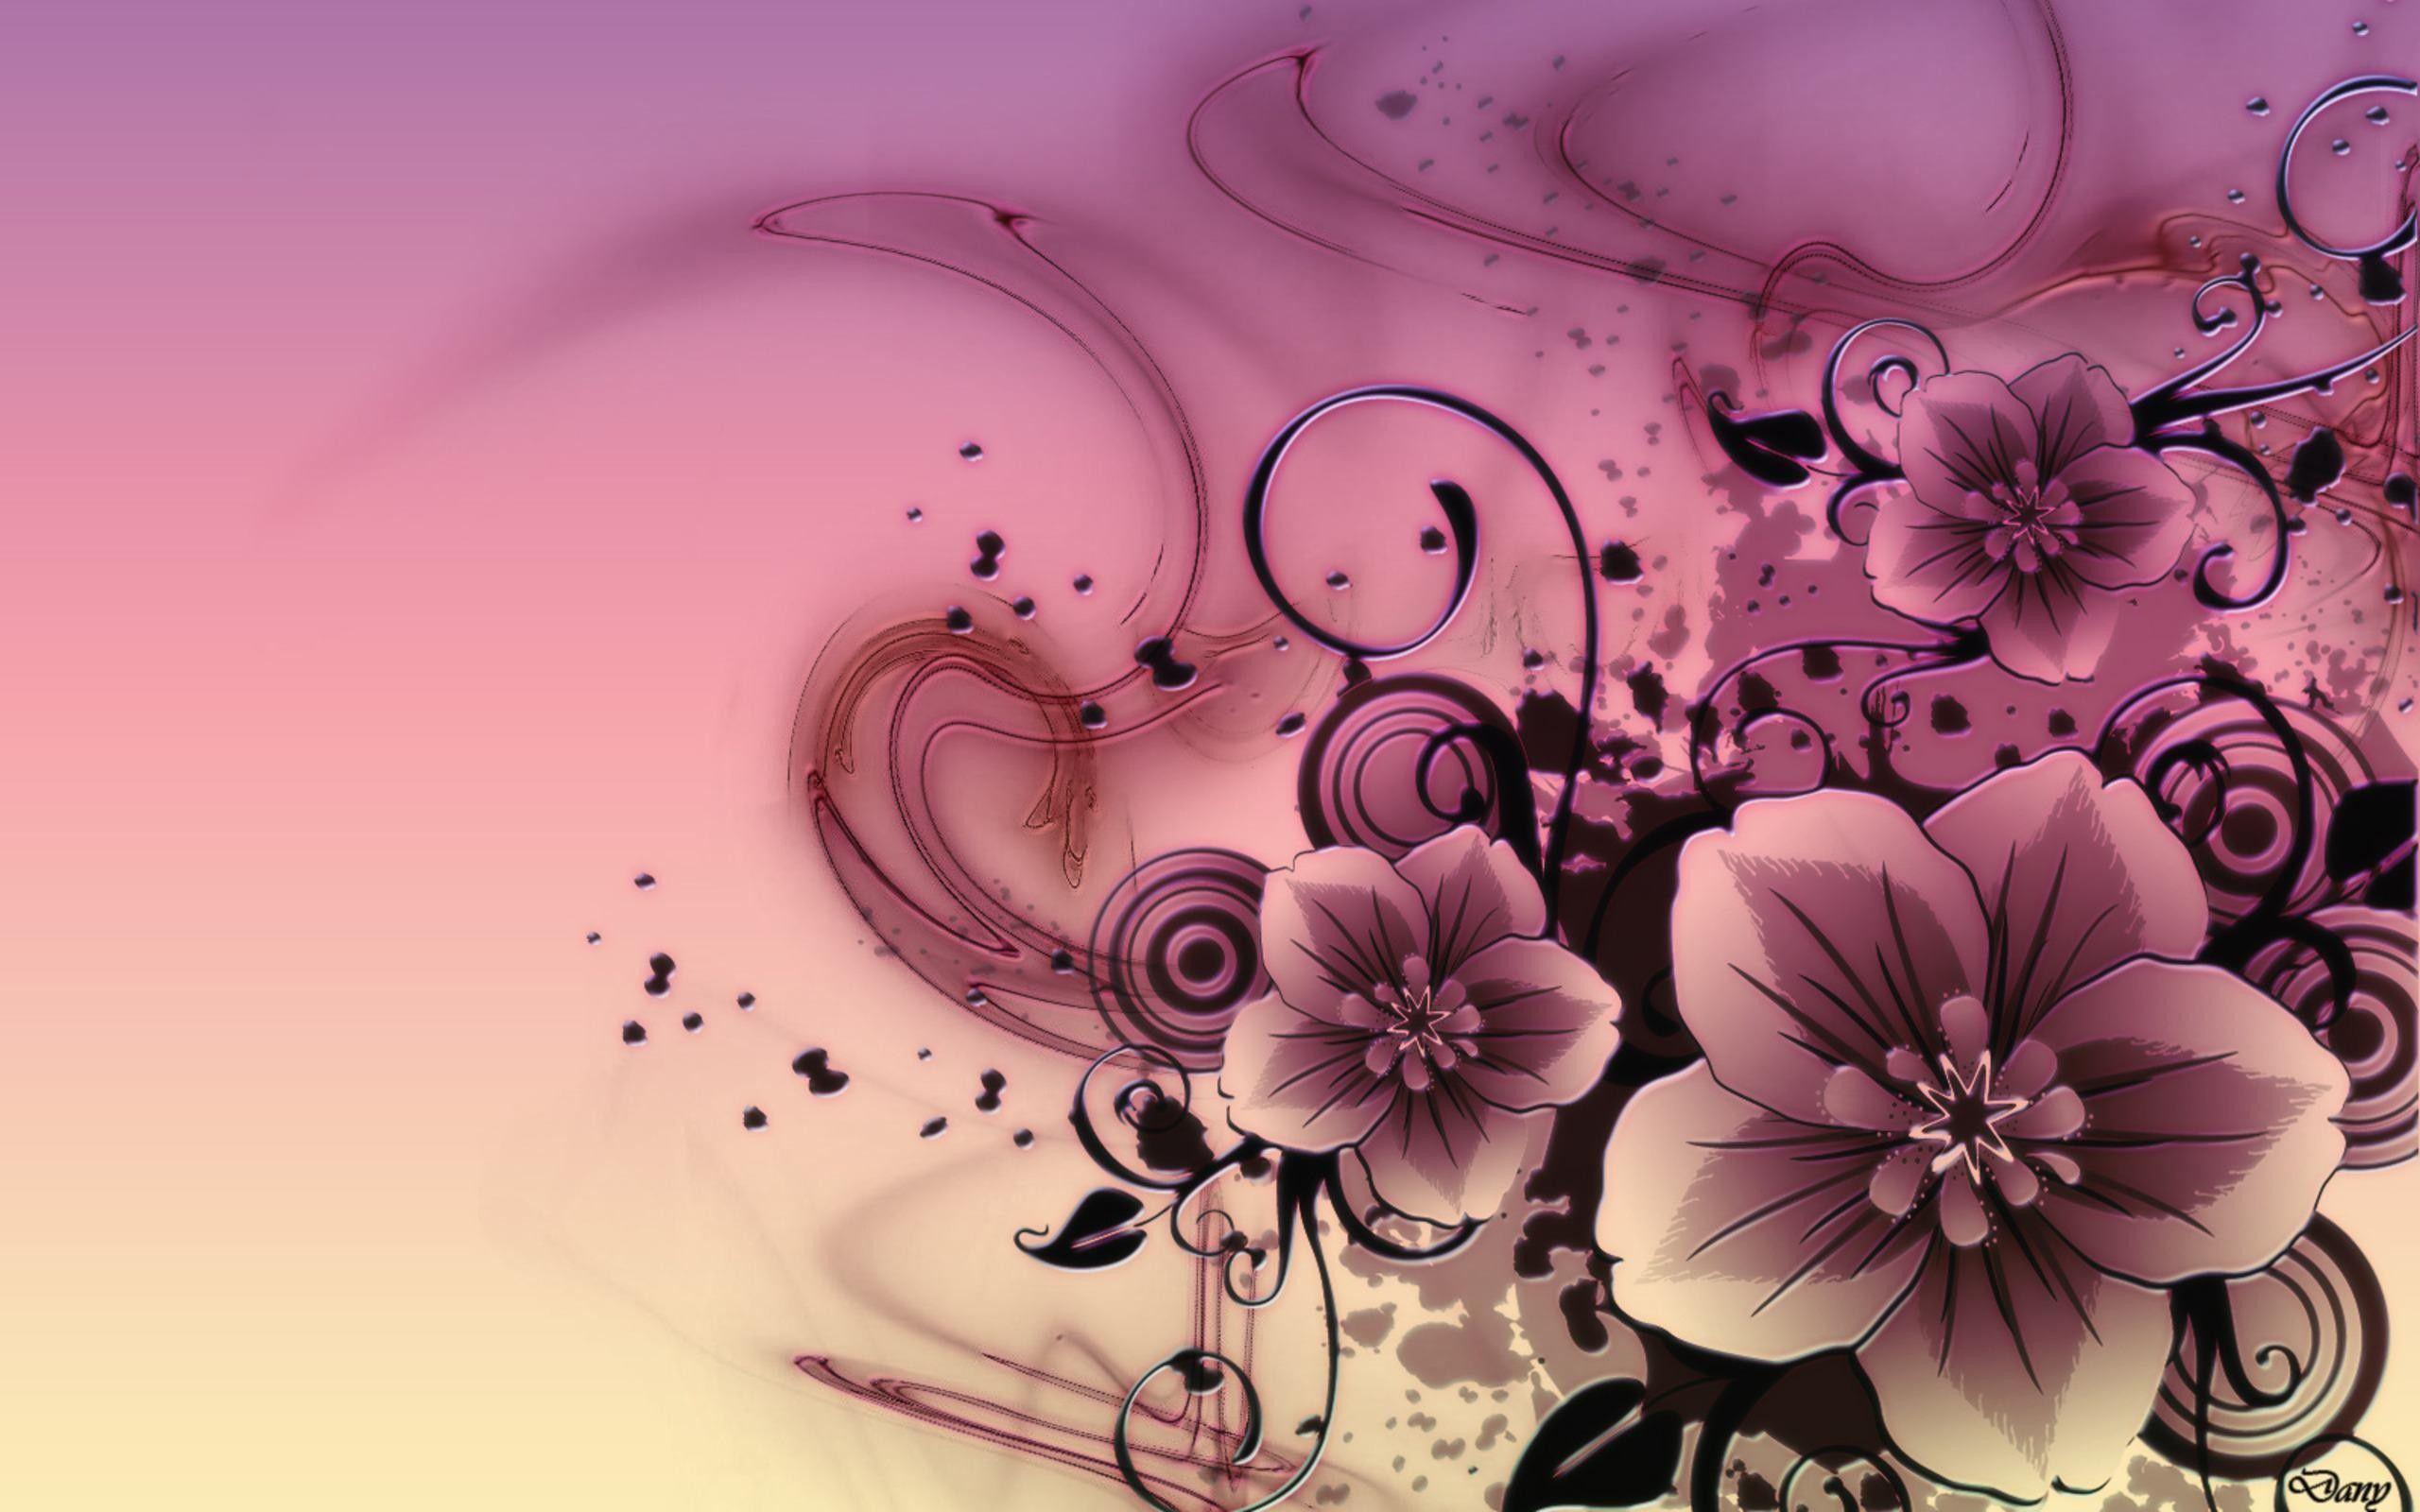 Beautiful Wallpapers For Desktop Background Full Screen Hd In 2020 Flower Desktop Wallpaper Flower Wallpaper Flower Art